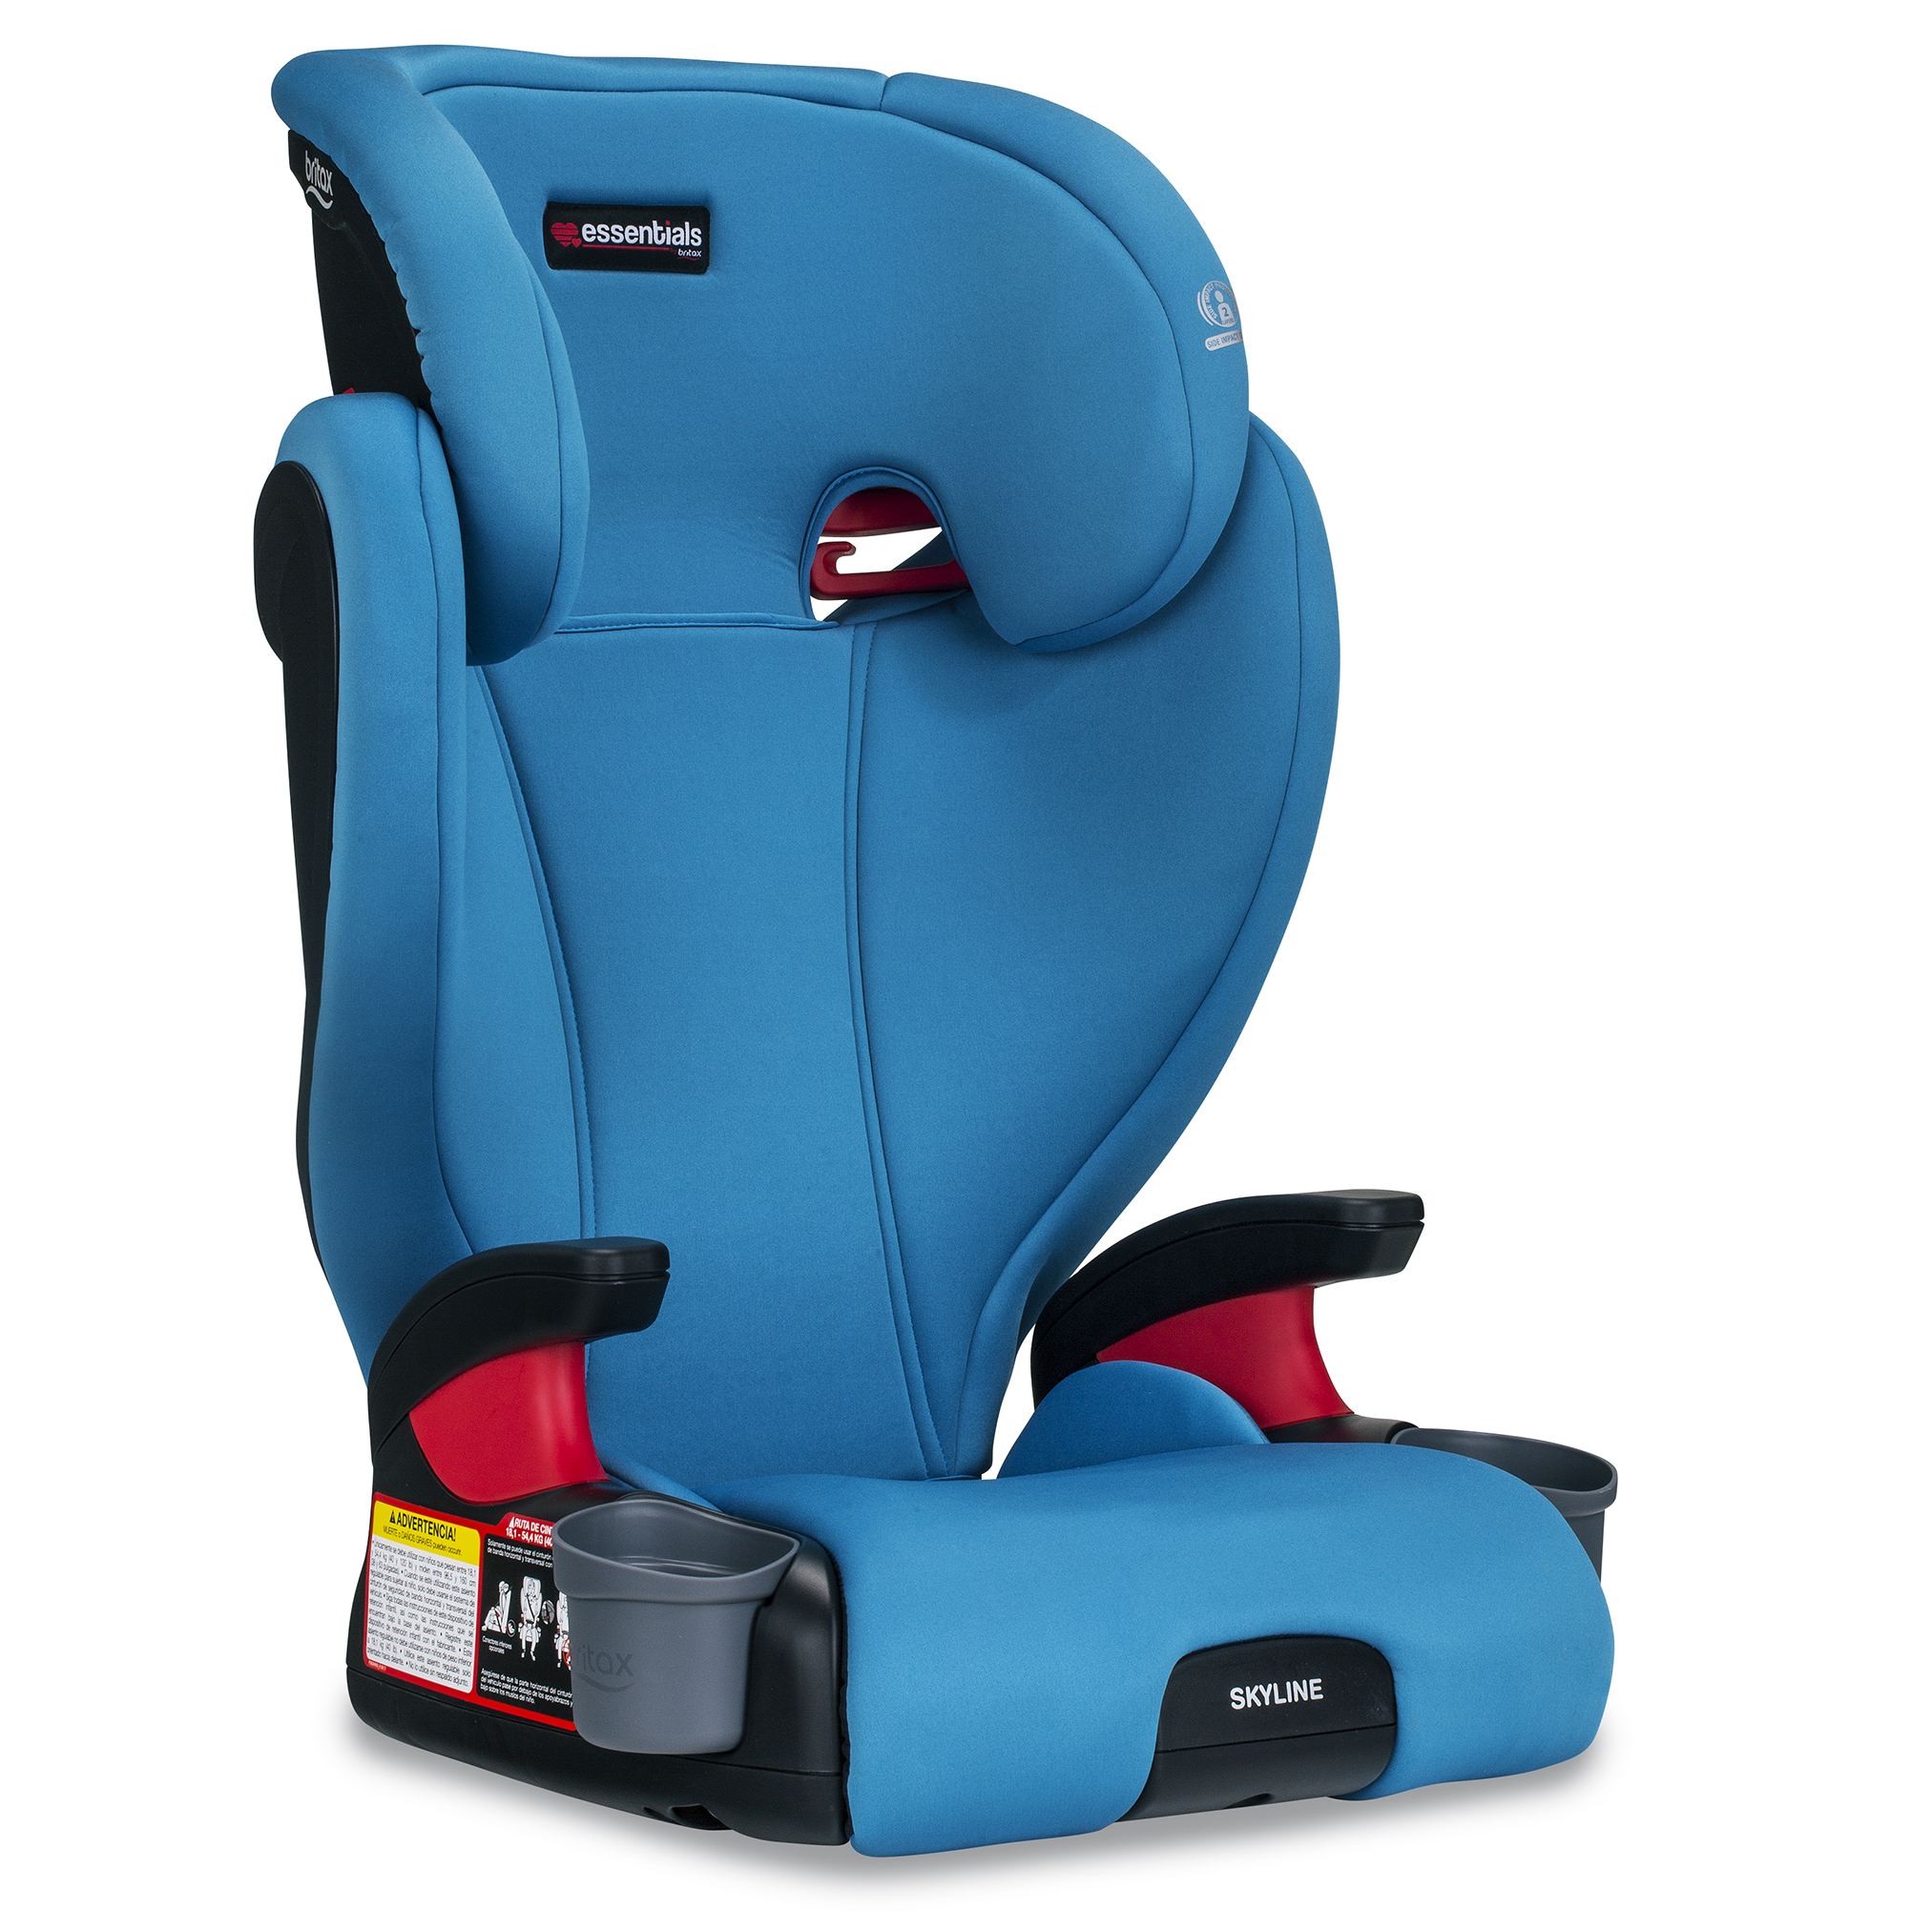 Britax Skyline Belt-Positioning Booster Seat, Teal by Britax